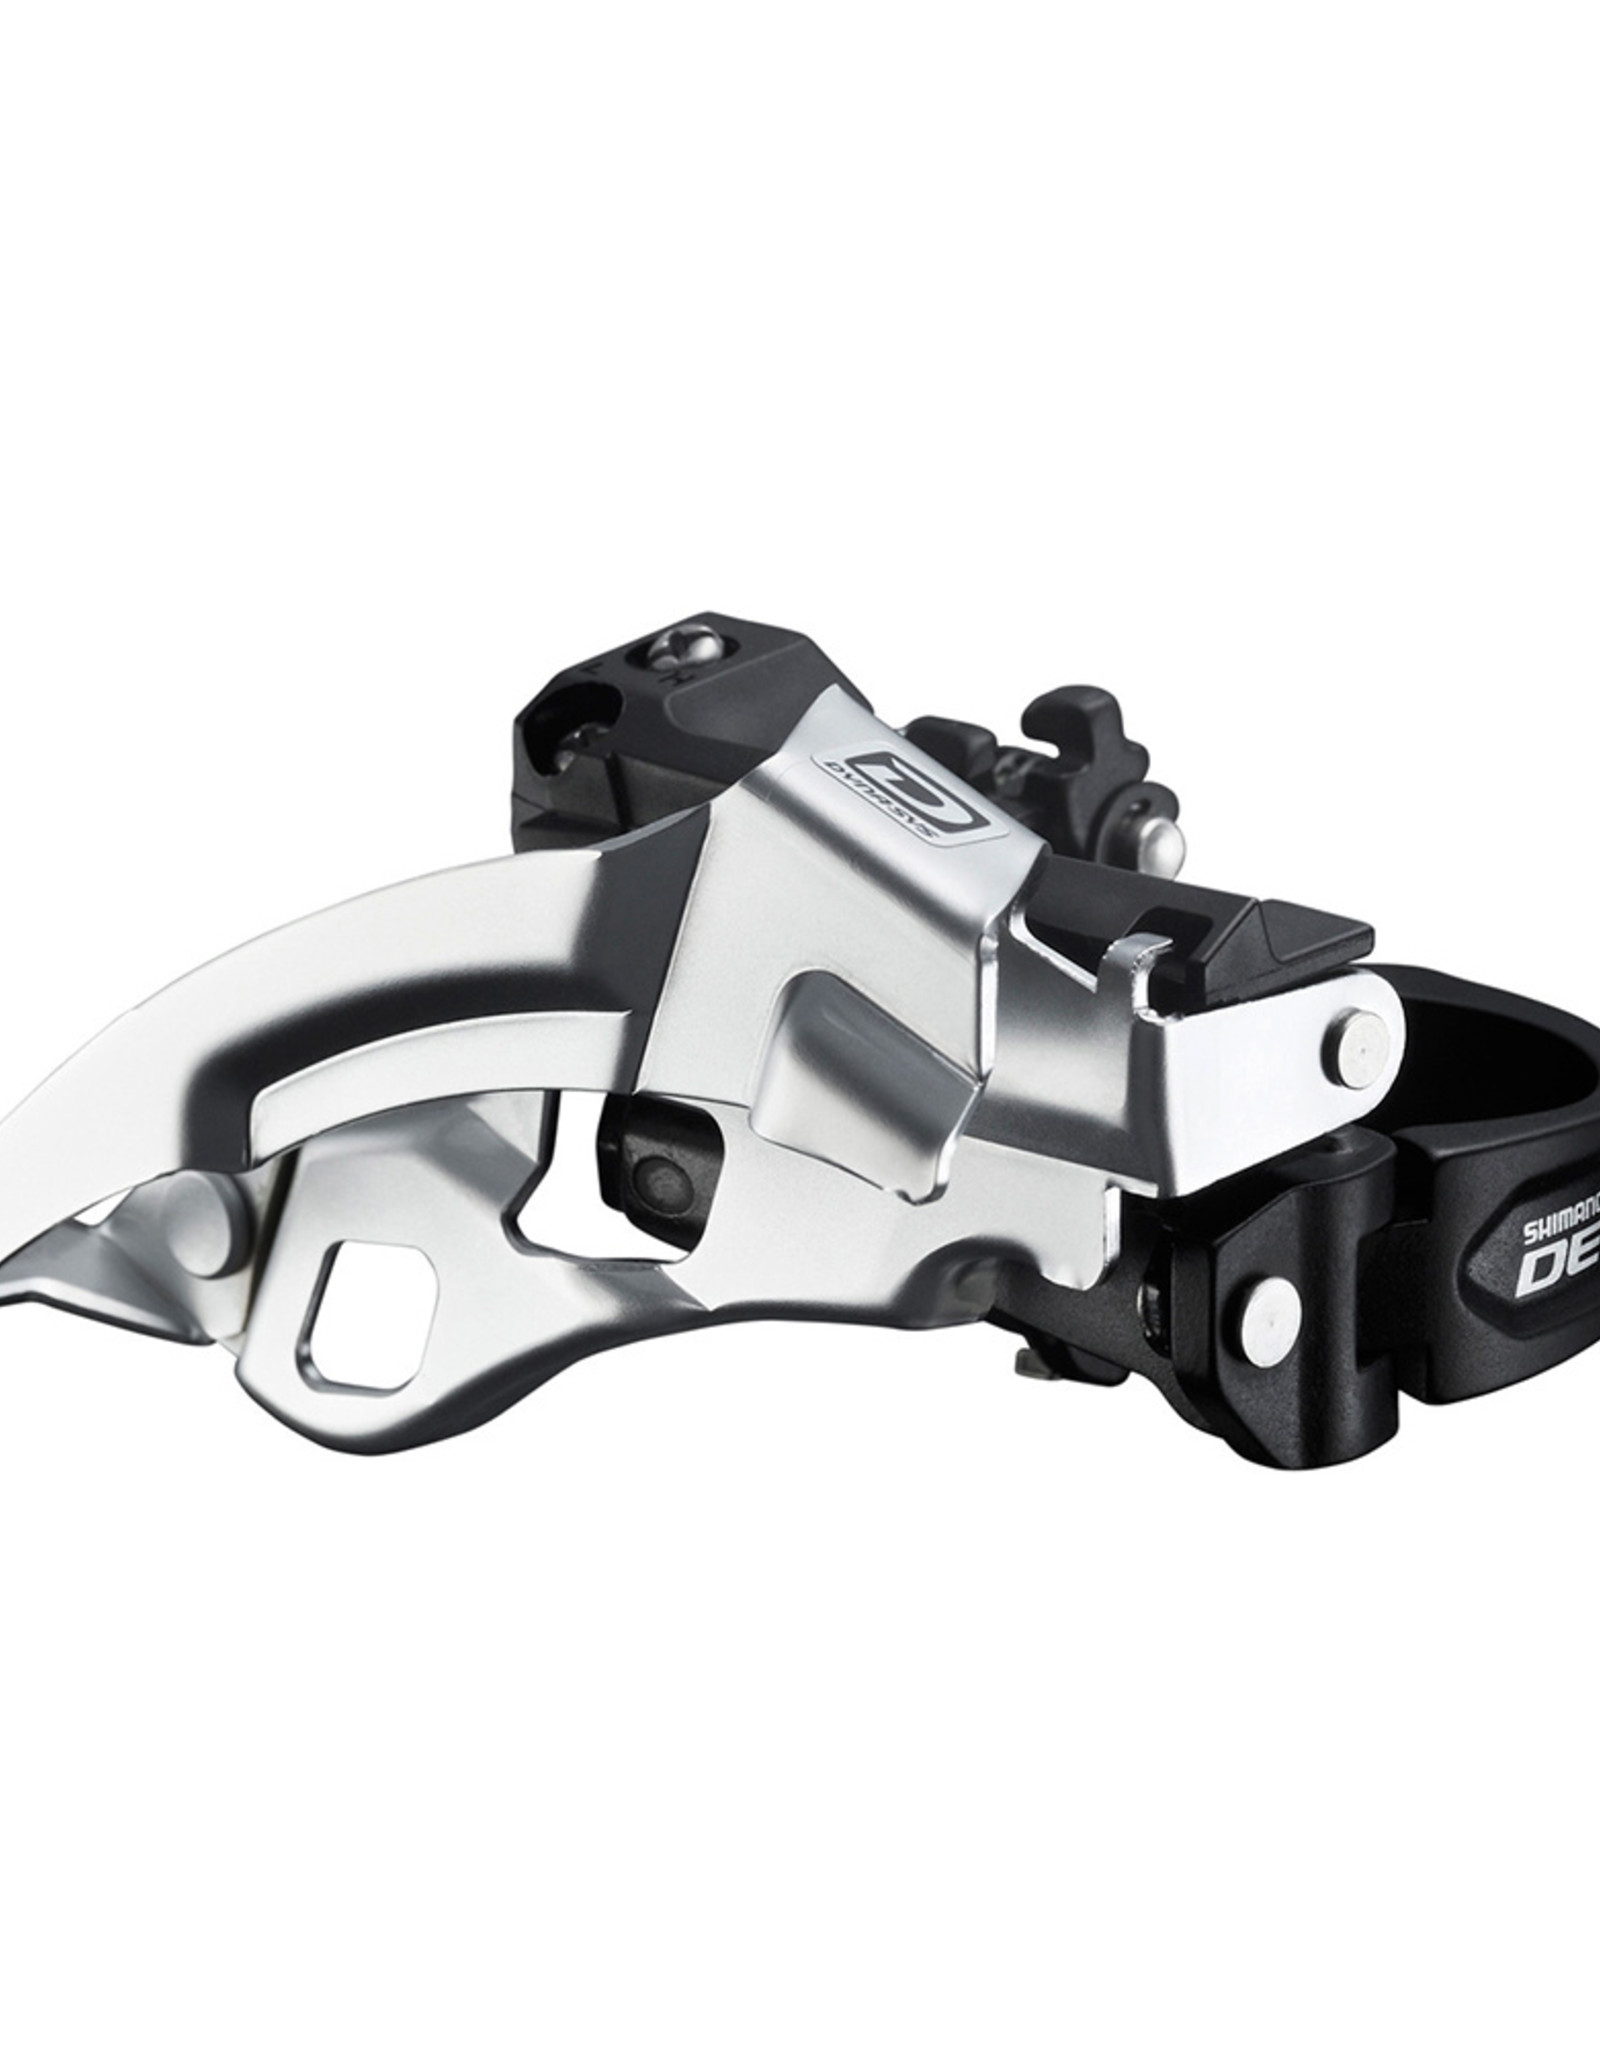 Shimano Shimano Deore FD-M590 9-Speed Triple Top-Swing Dual-Pull Front Derailleur